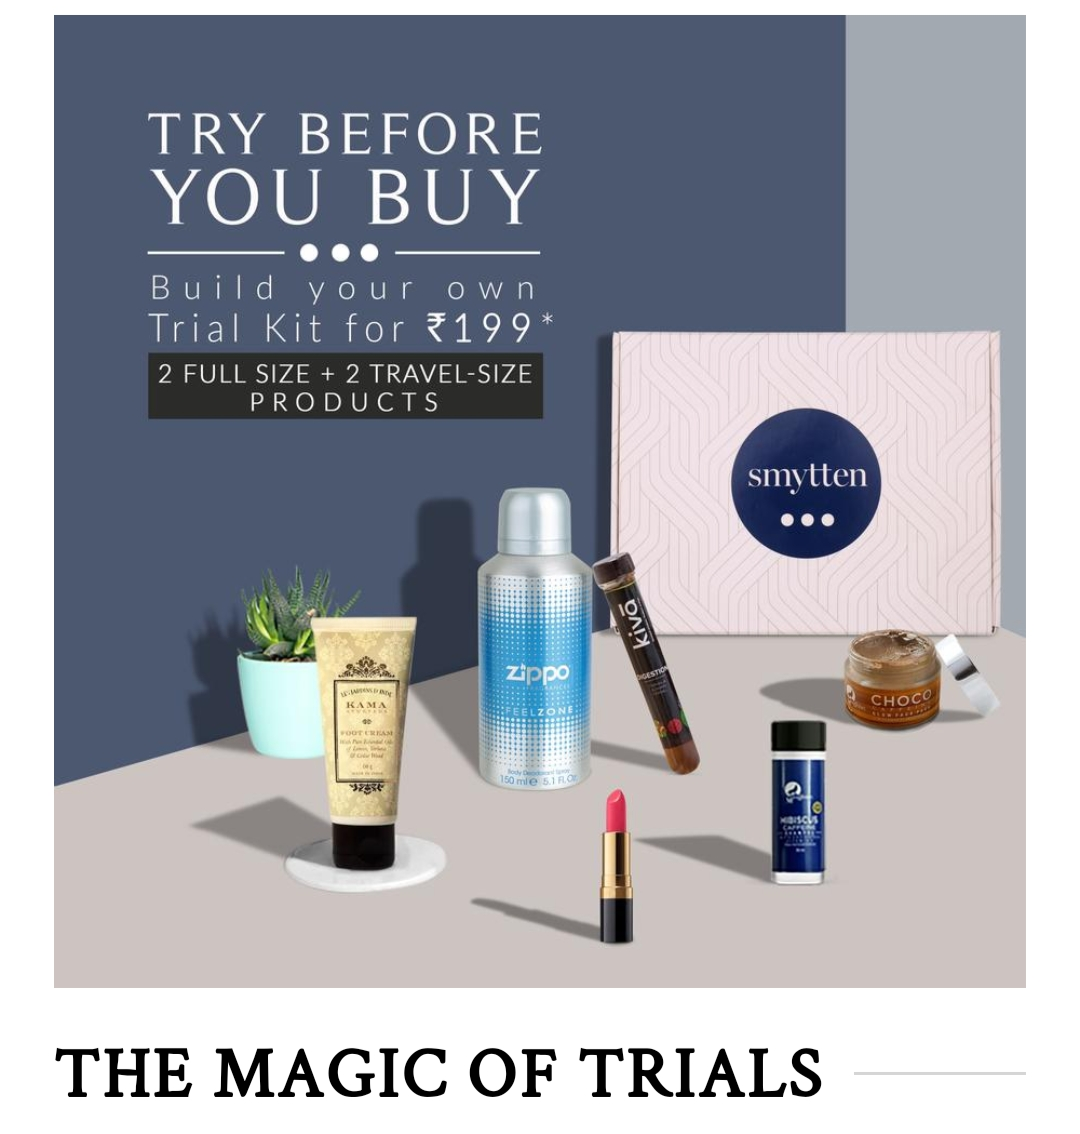 Smytten products, symtten website, review